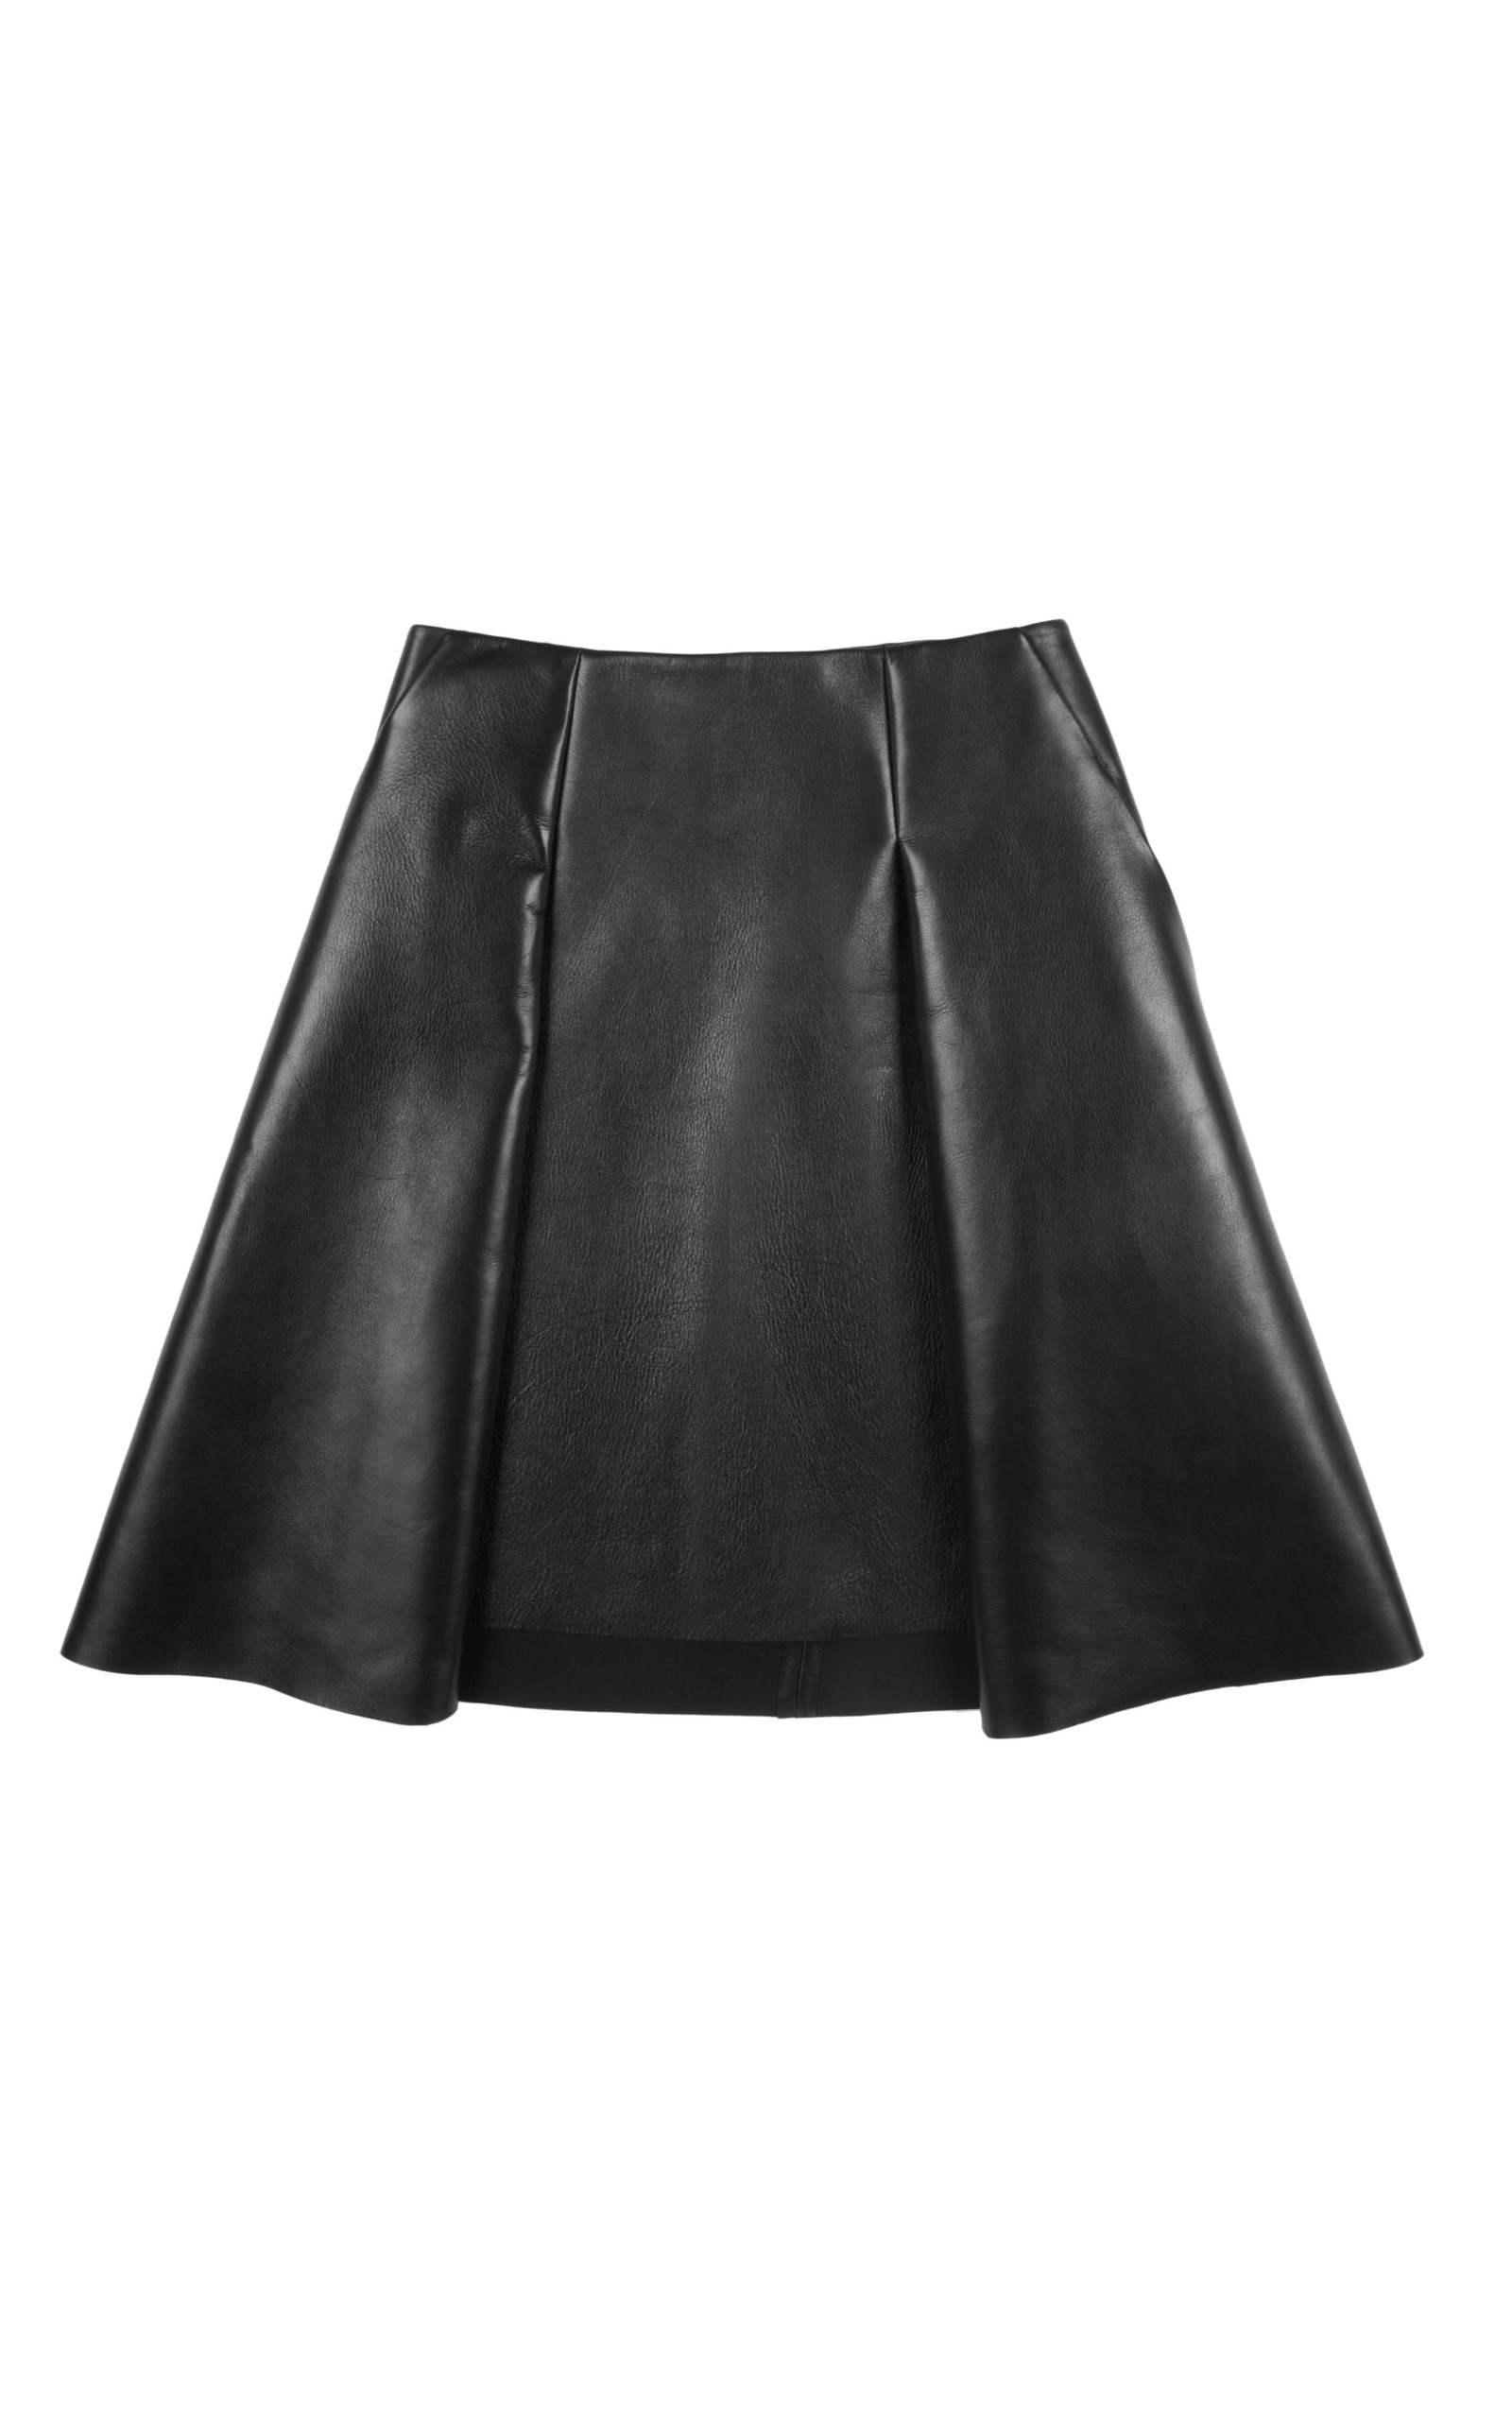 06a15dbc0e Stockman Leather Skirt by Dion Lee | Moda Operandi